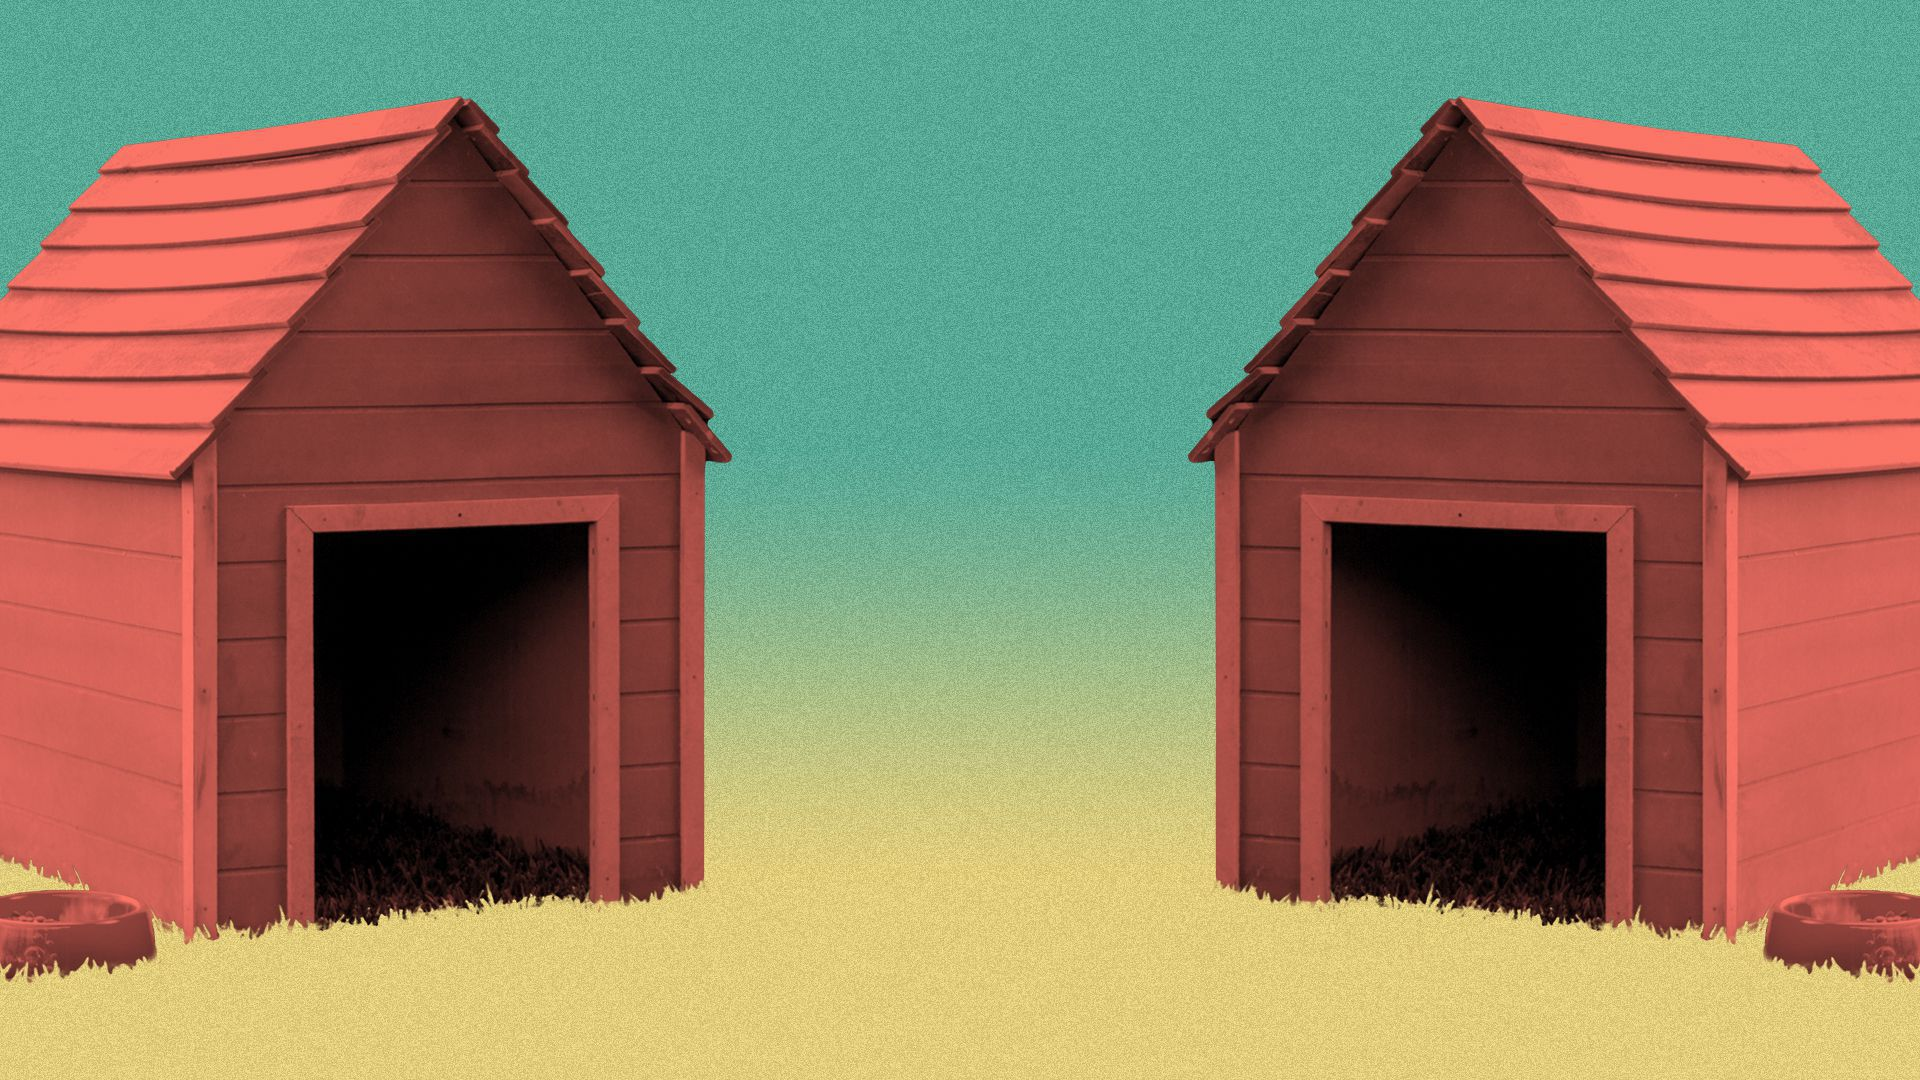 Illustration of two dog houses.